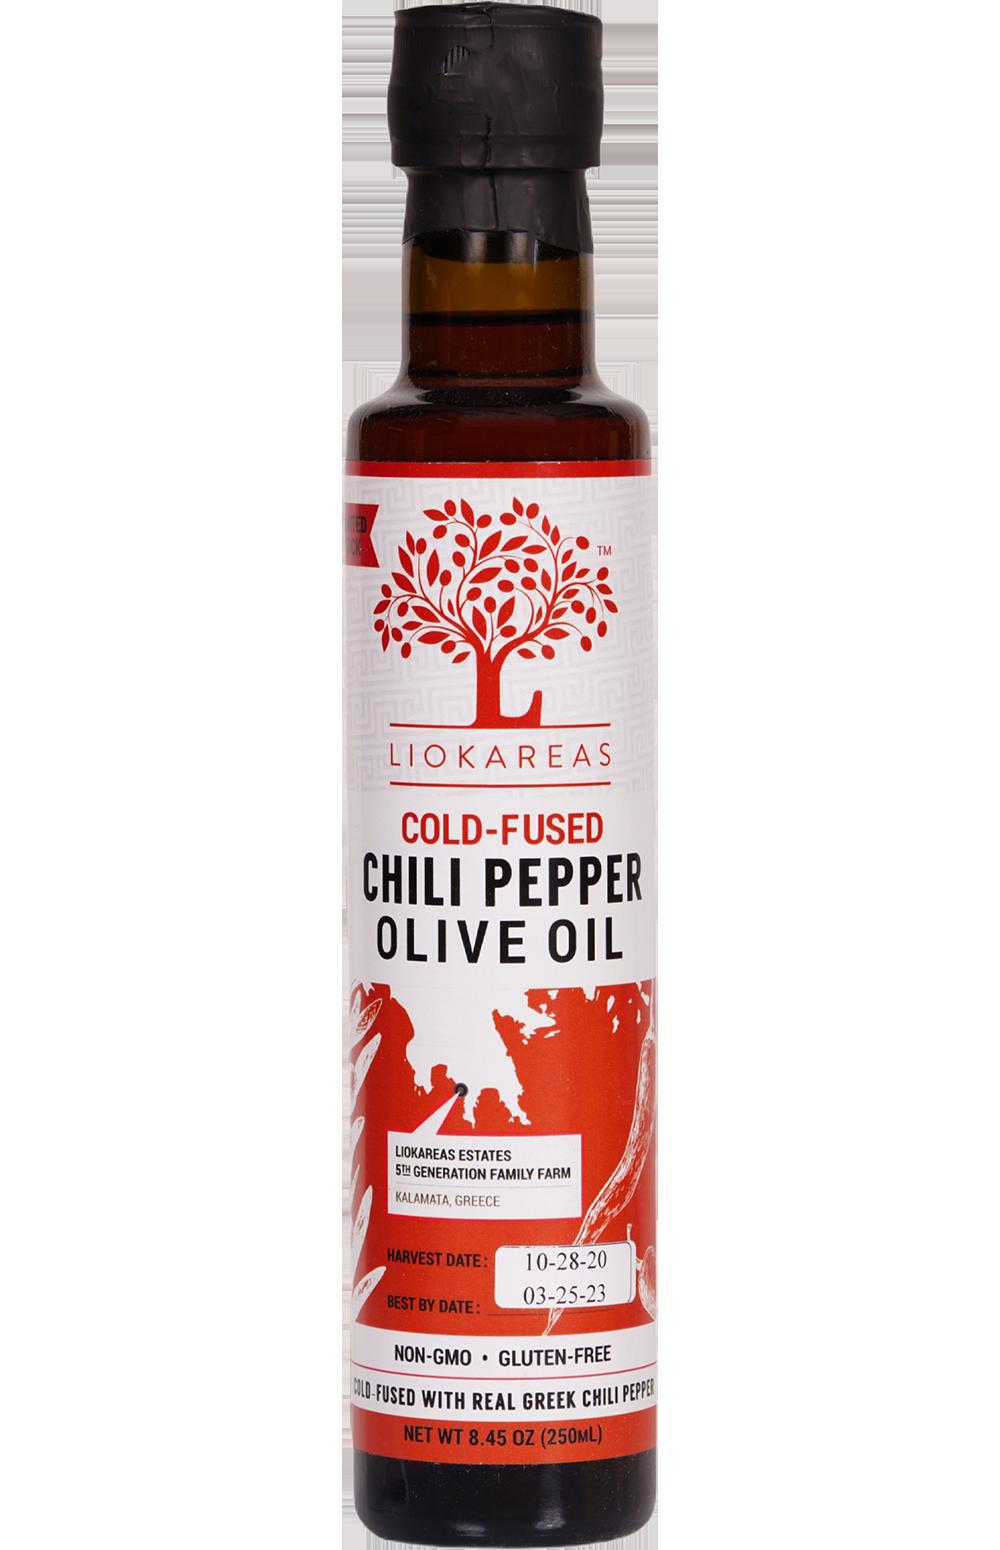 Liokareas Cold Fused Chili Pepper